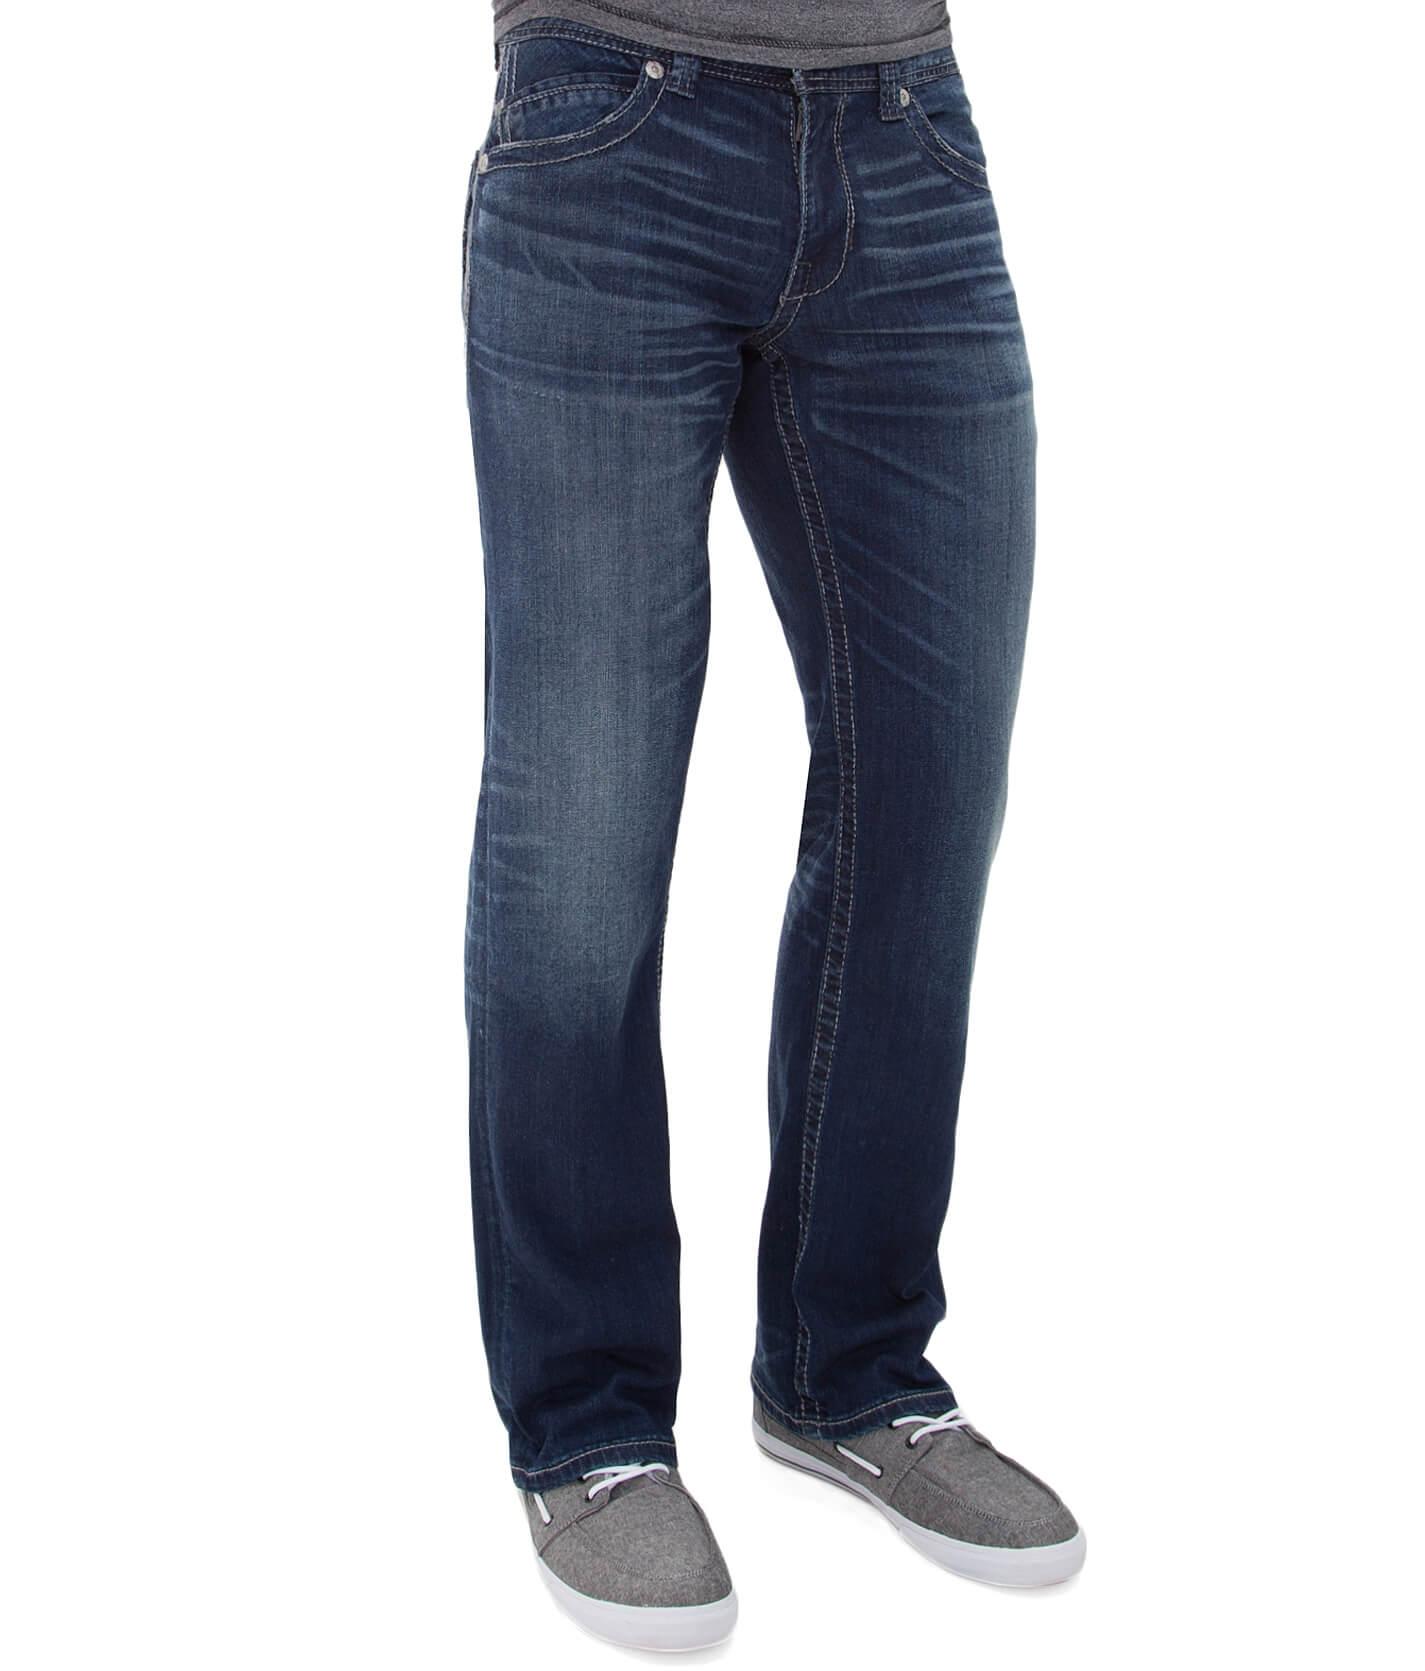 ee3d3b98f84d Buckle Black Nine Boot Stretch Jean [6XuXh0507155] - $39.99